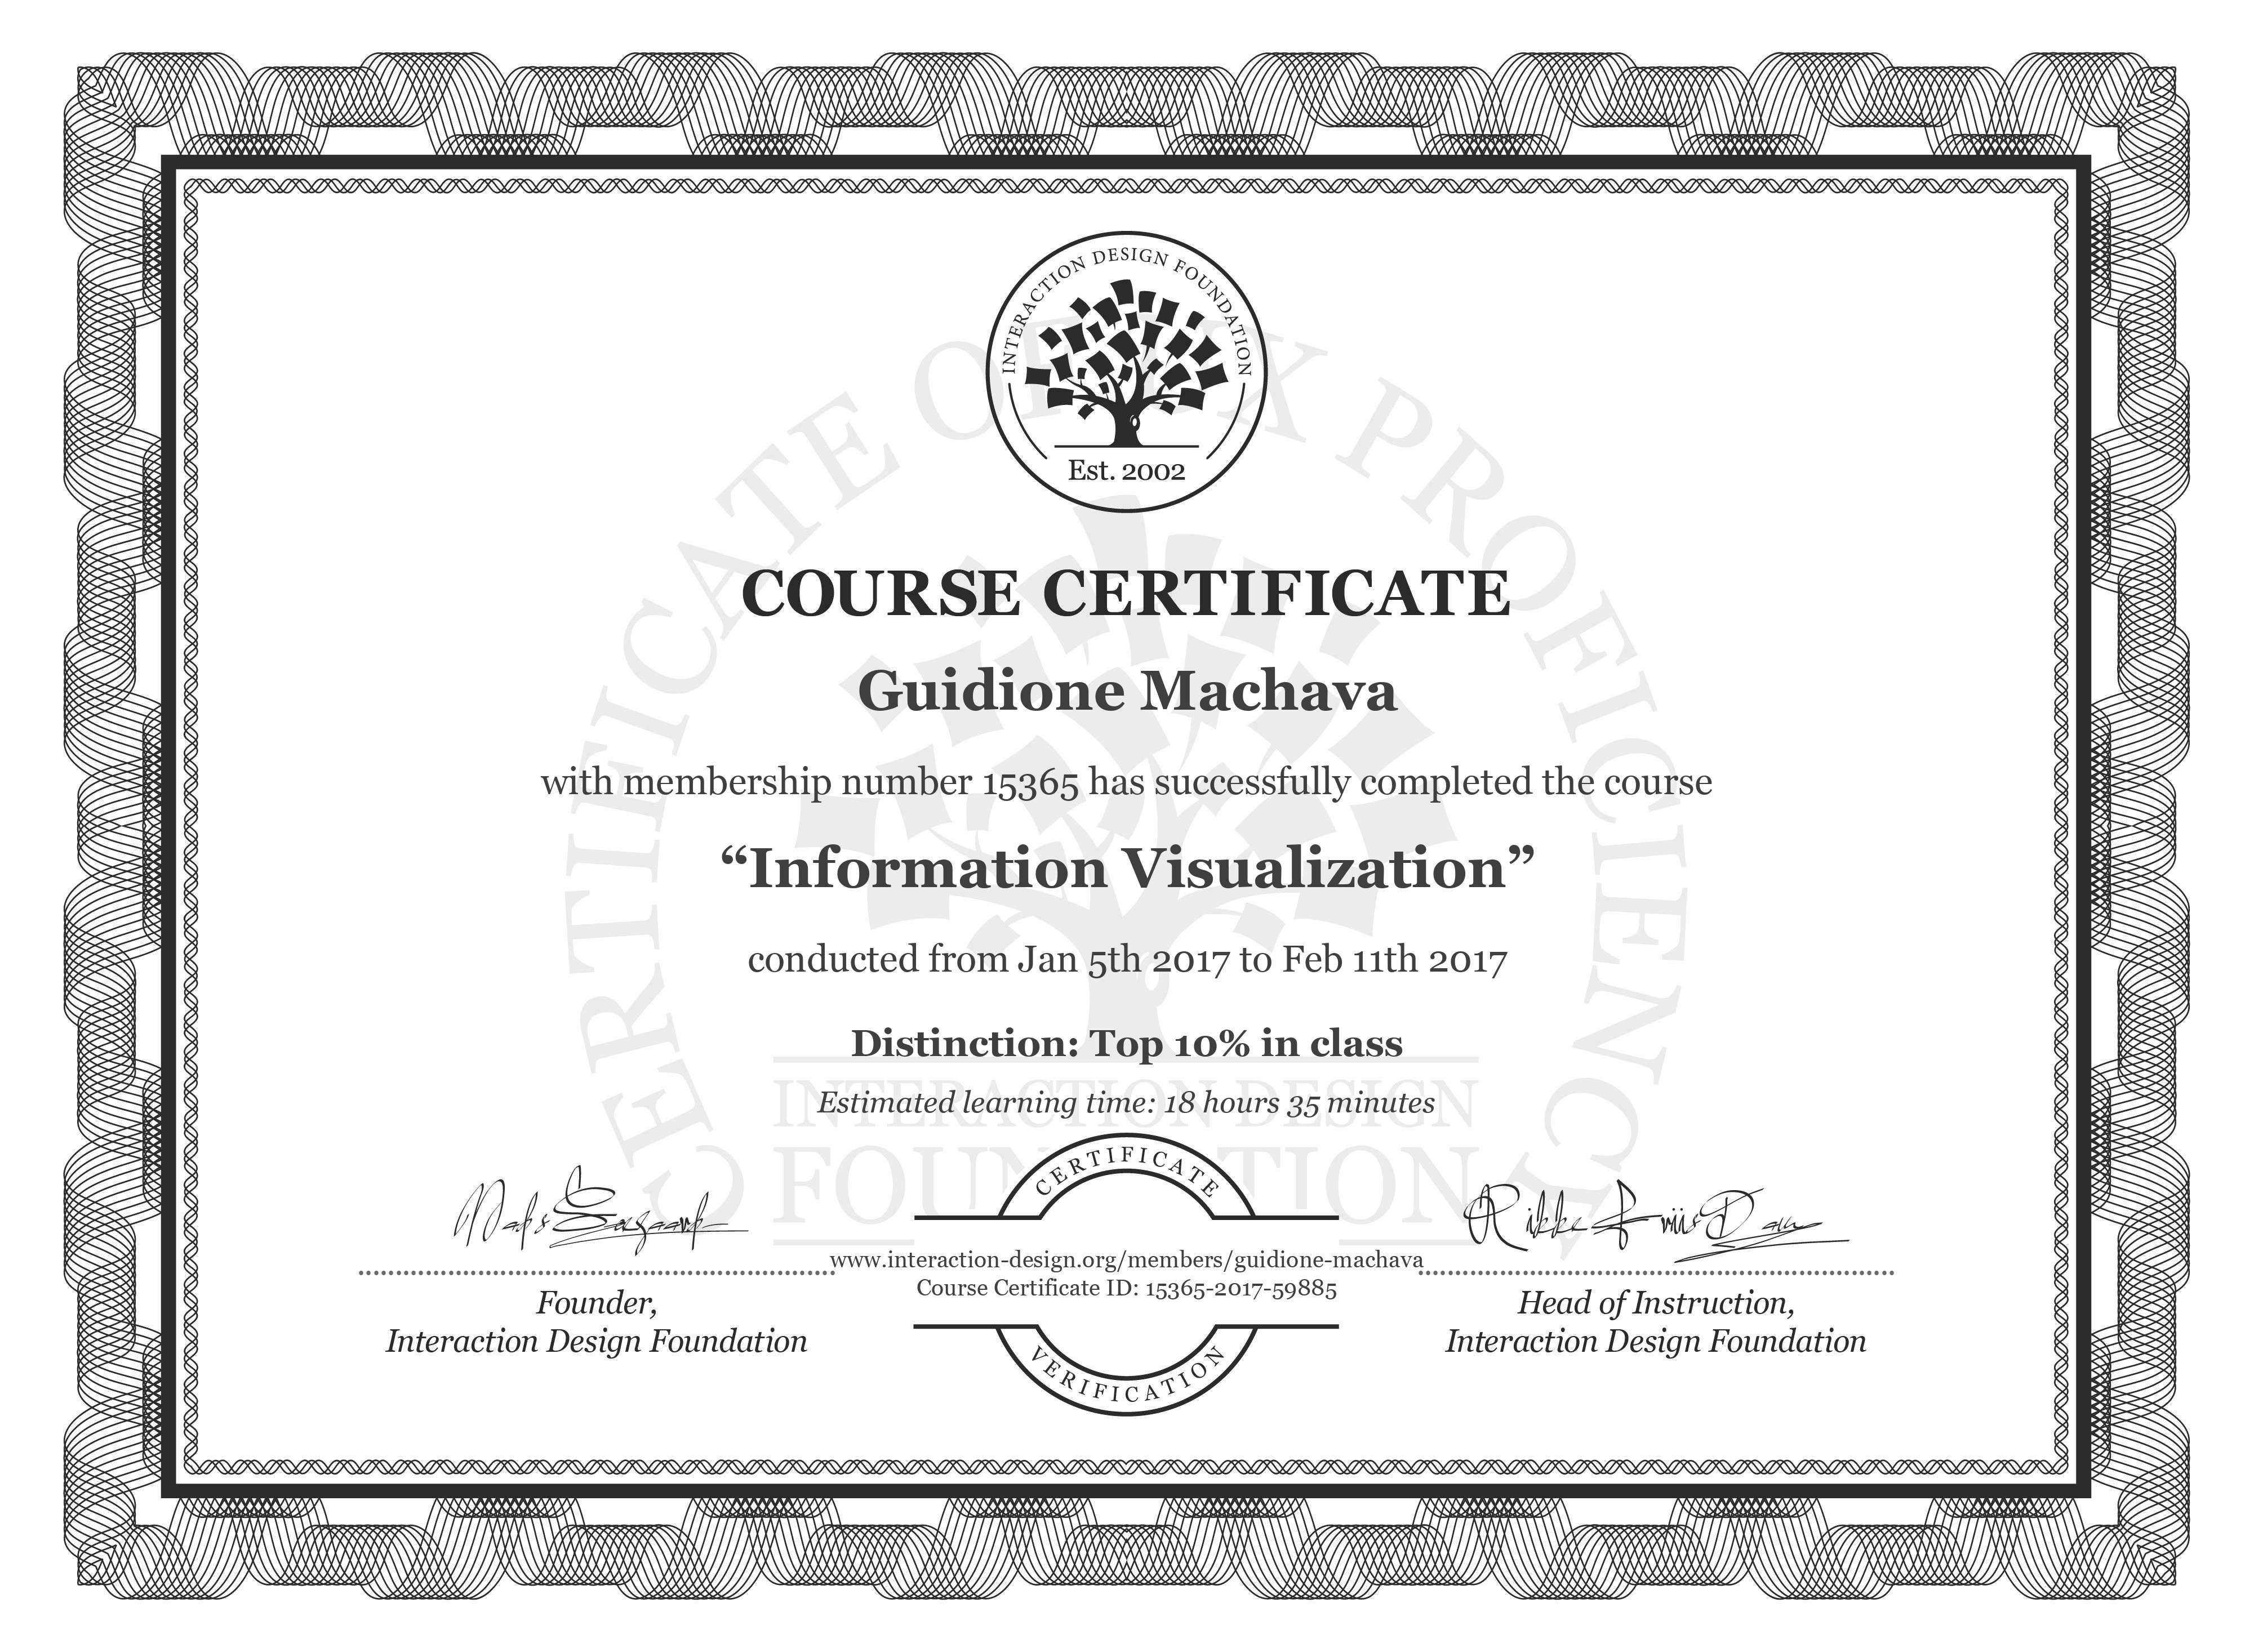 Guidione Machava's Course Certificate: Information Visualization